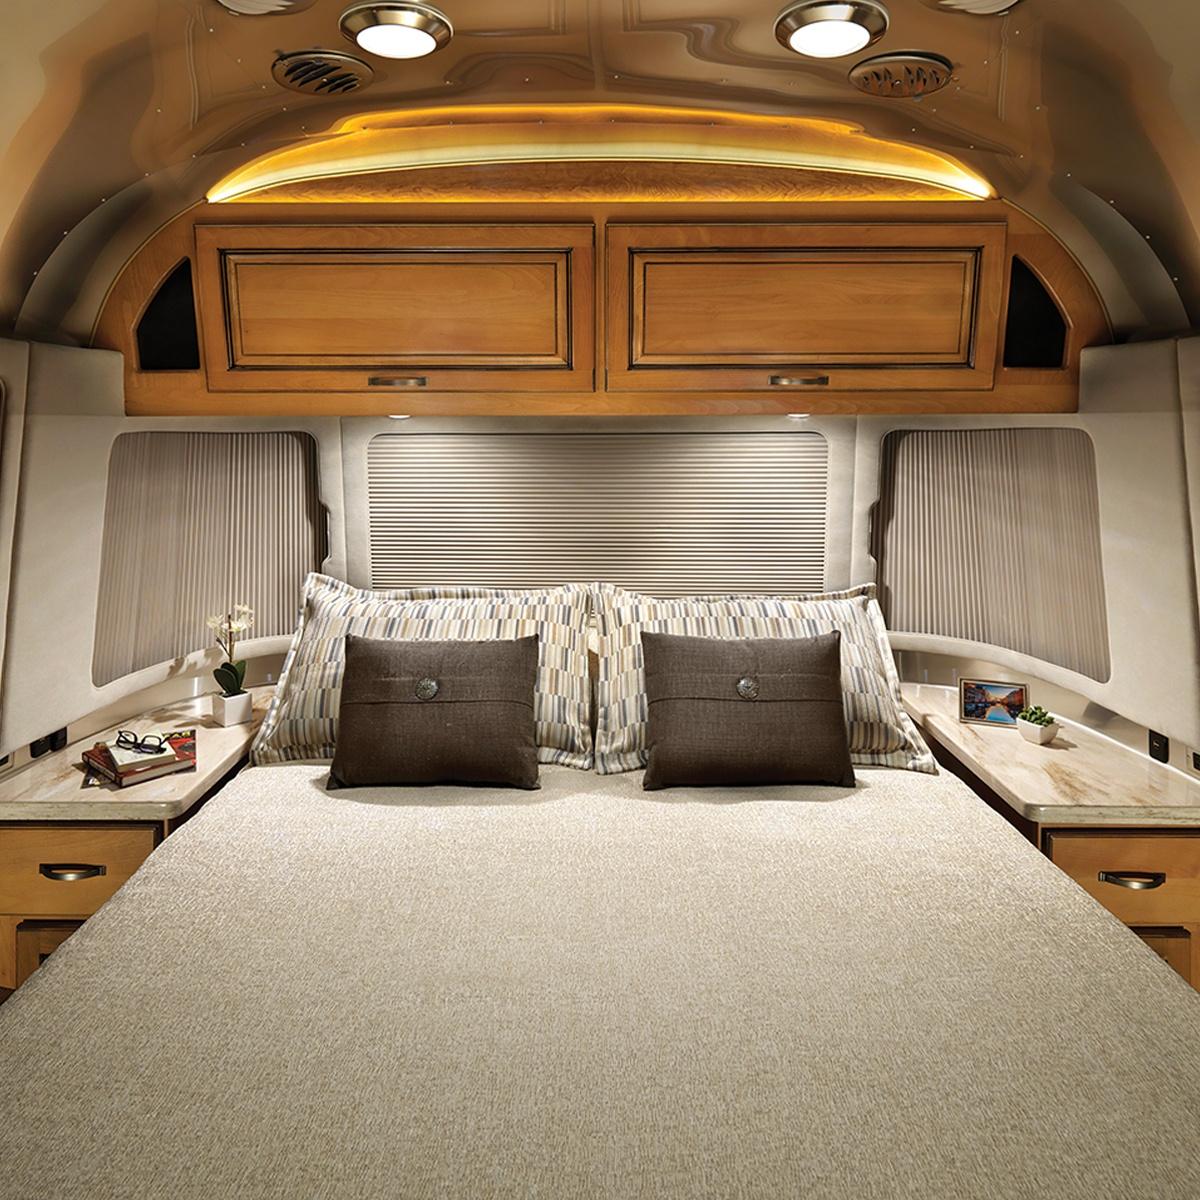 Merveilleux Airstream